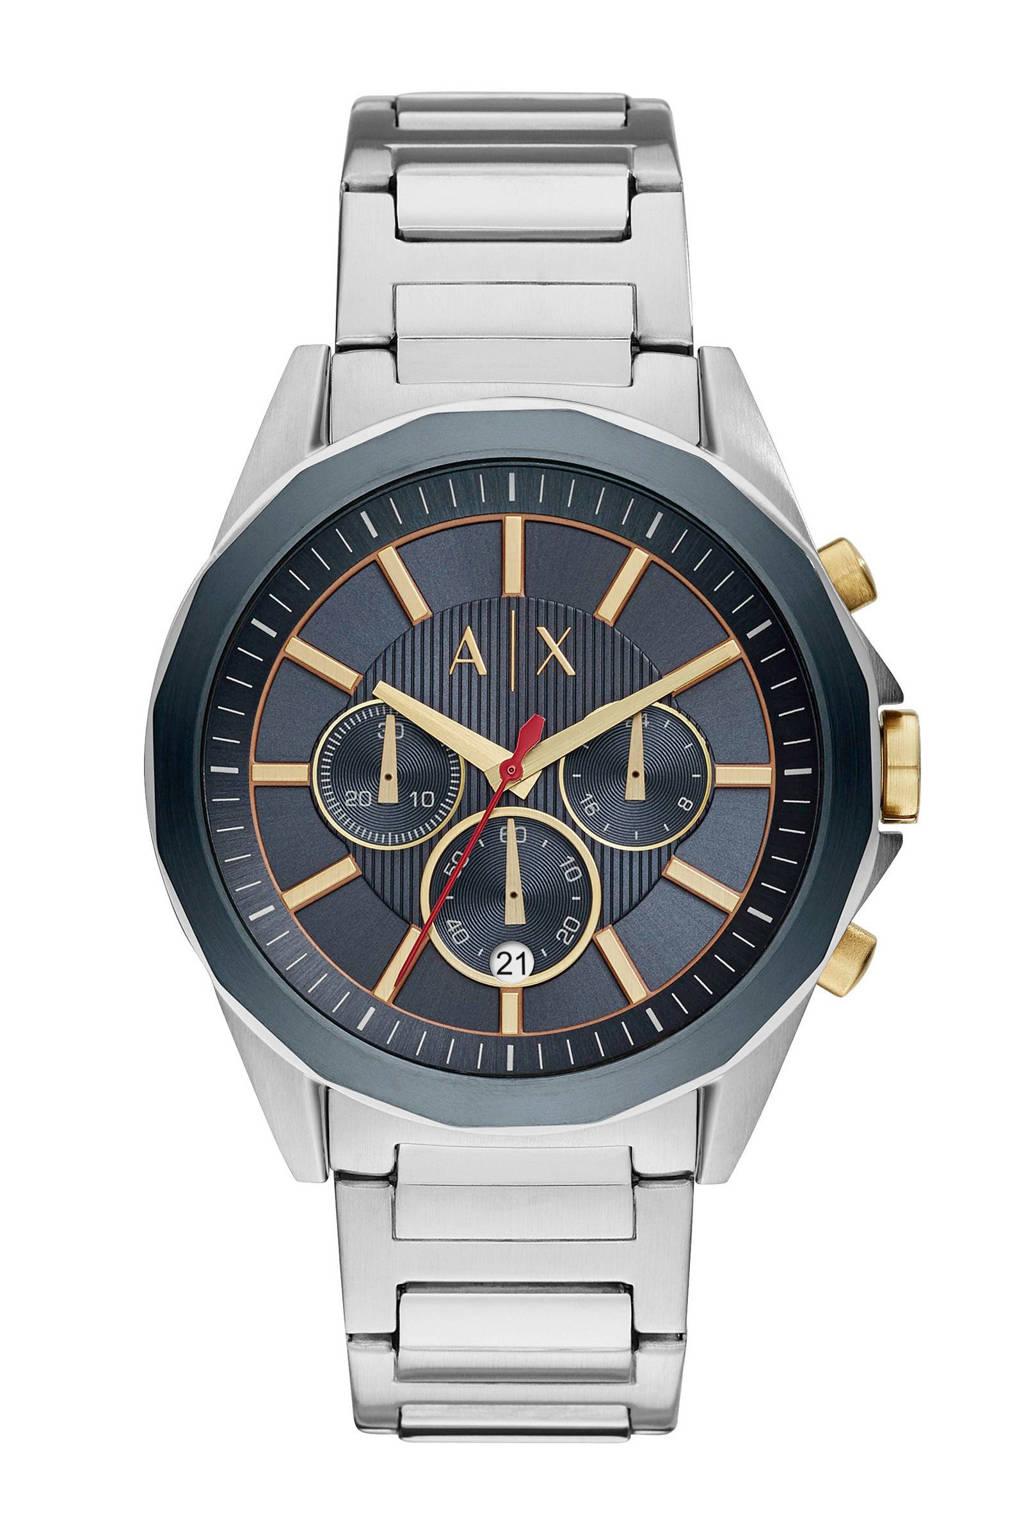 Armani Exchange horloge Drexler AX2614, rvs/blauw